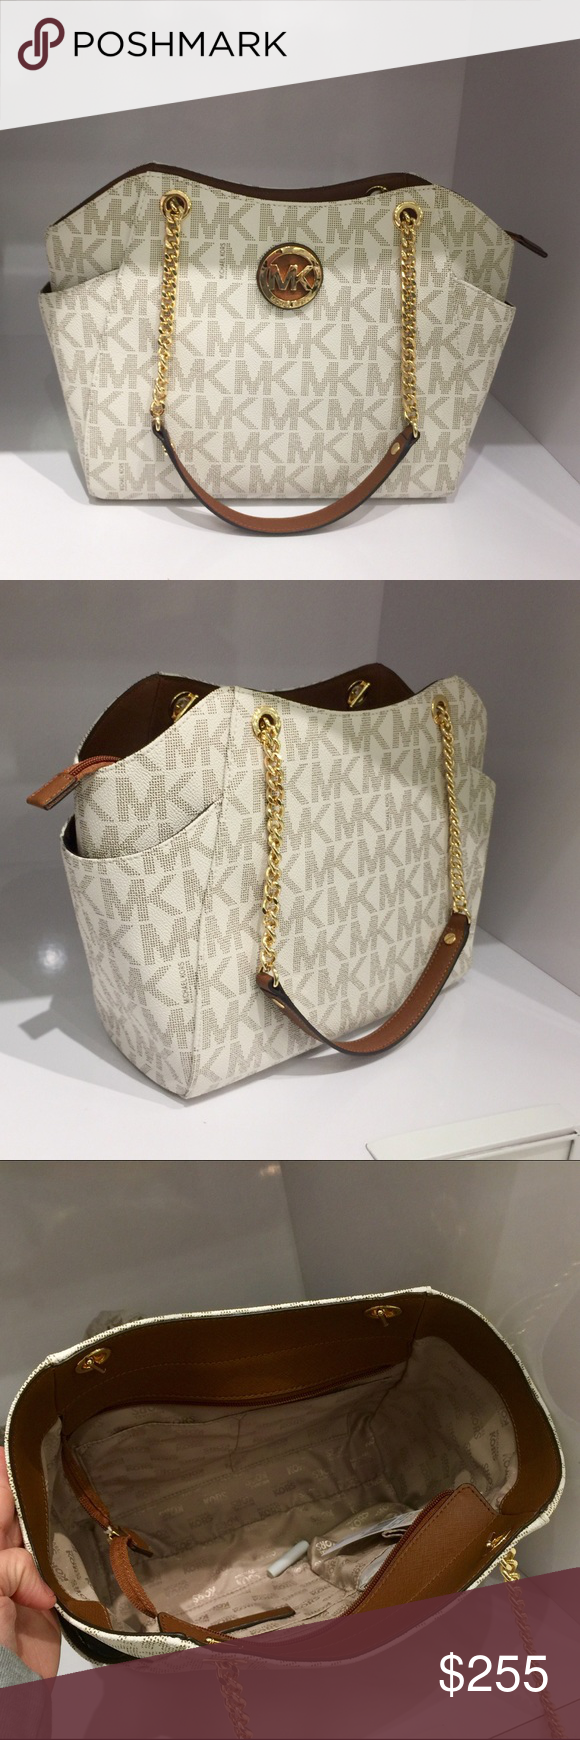 🌴Michael Kors Bag🌴 100% Authentic Michael Kors Shoulder Bag, brand new with tag!😍😍😍 Michael Kors Bags Shoulder Bags